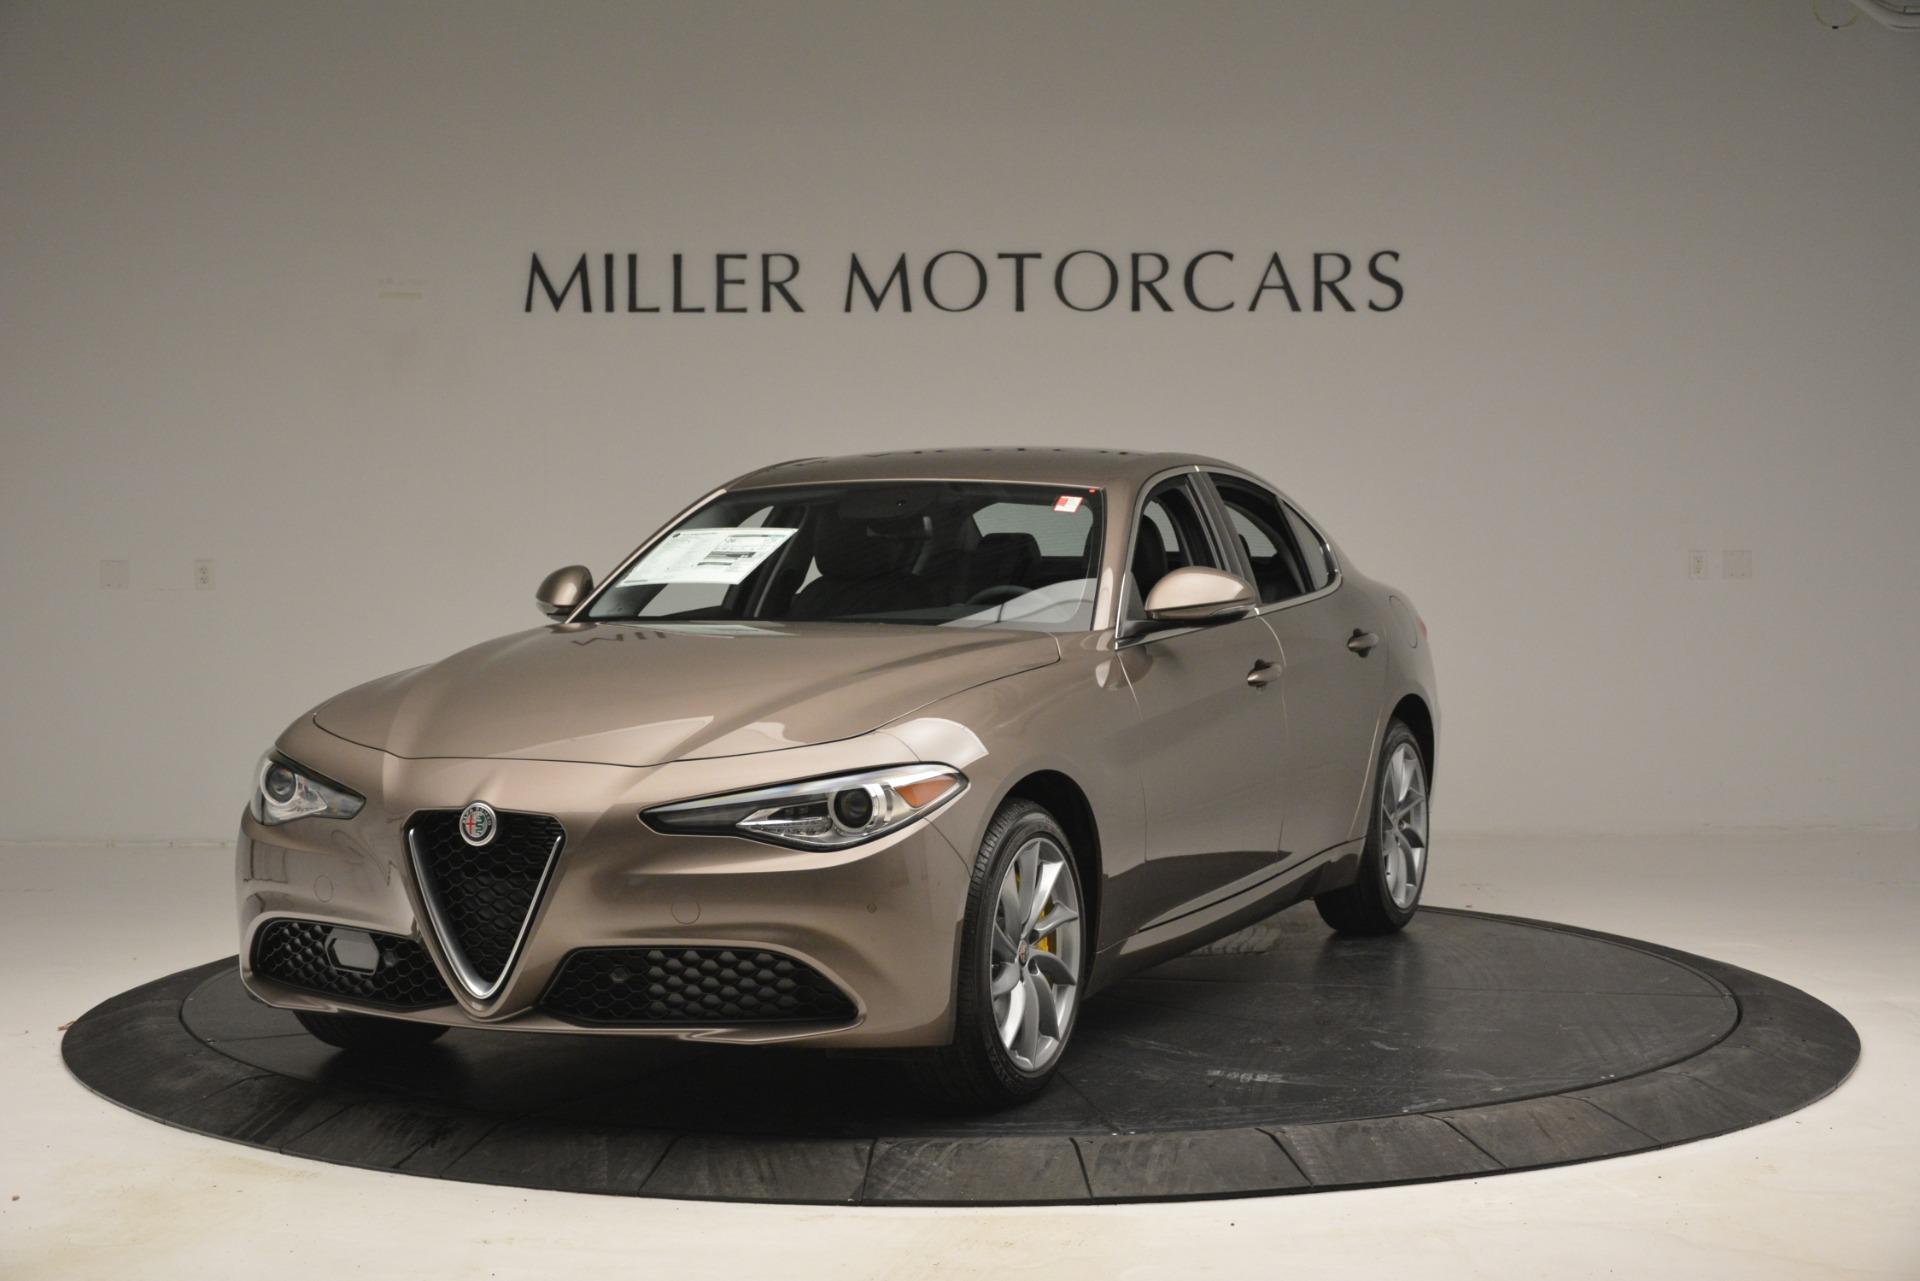 New 2019 Alfa Romeo Giulia Q4 for sale $45,240 at Rolls-Royce Motor Cars Greenwich in Greenwich CT 06830 1